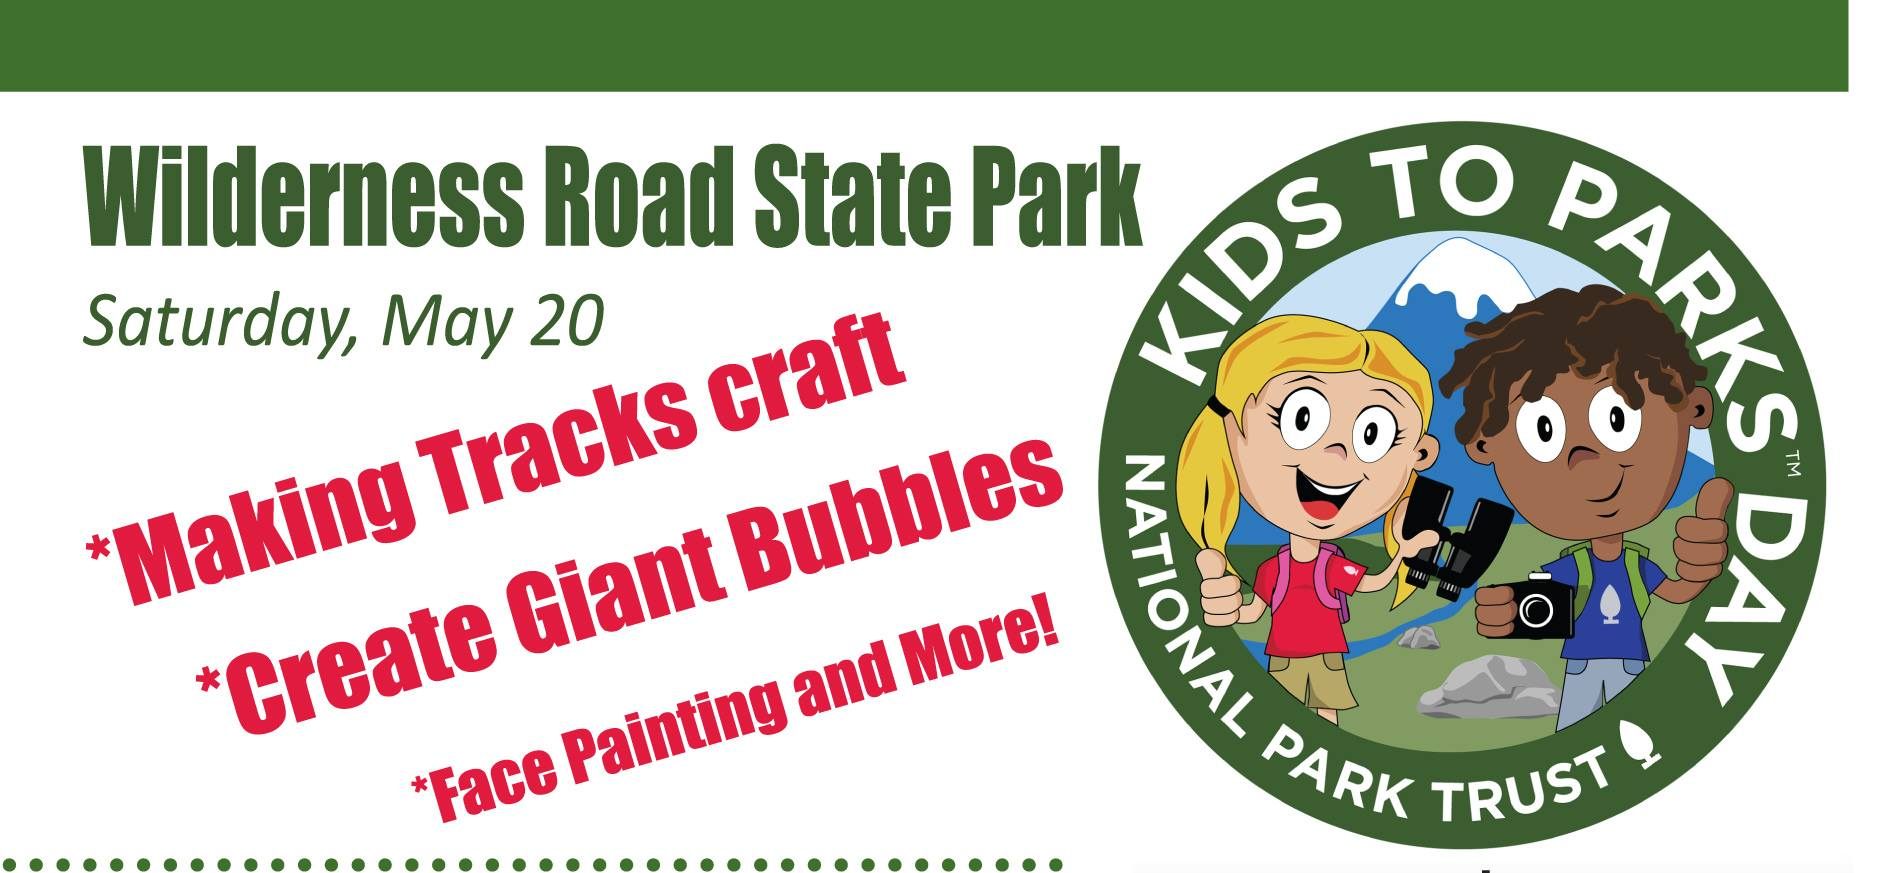 Friends of Wilderness Road State Park  8051 Wilderness Rd, Ewing, Virginia 24248